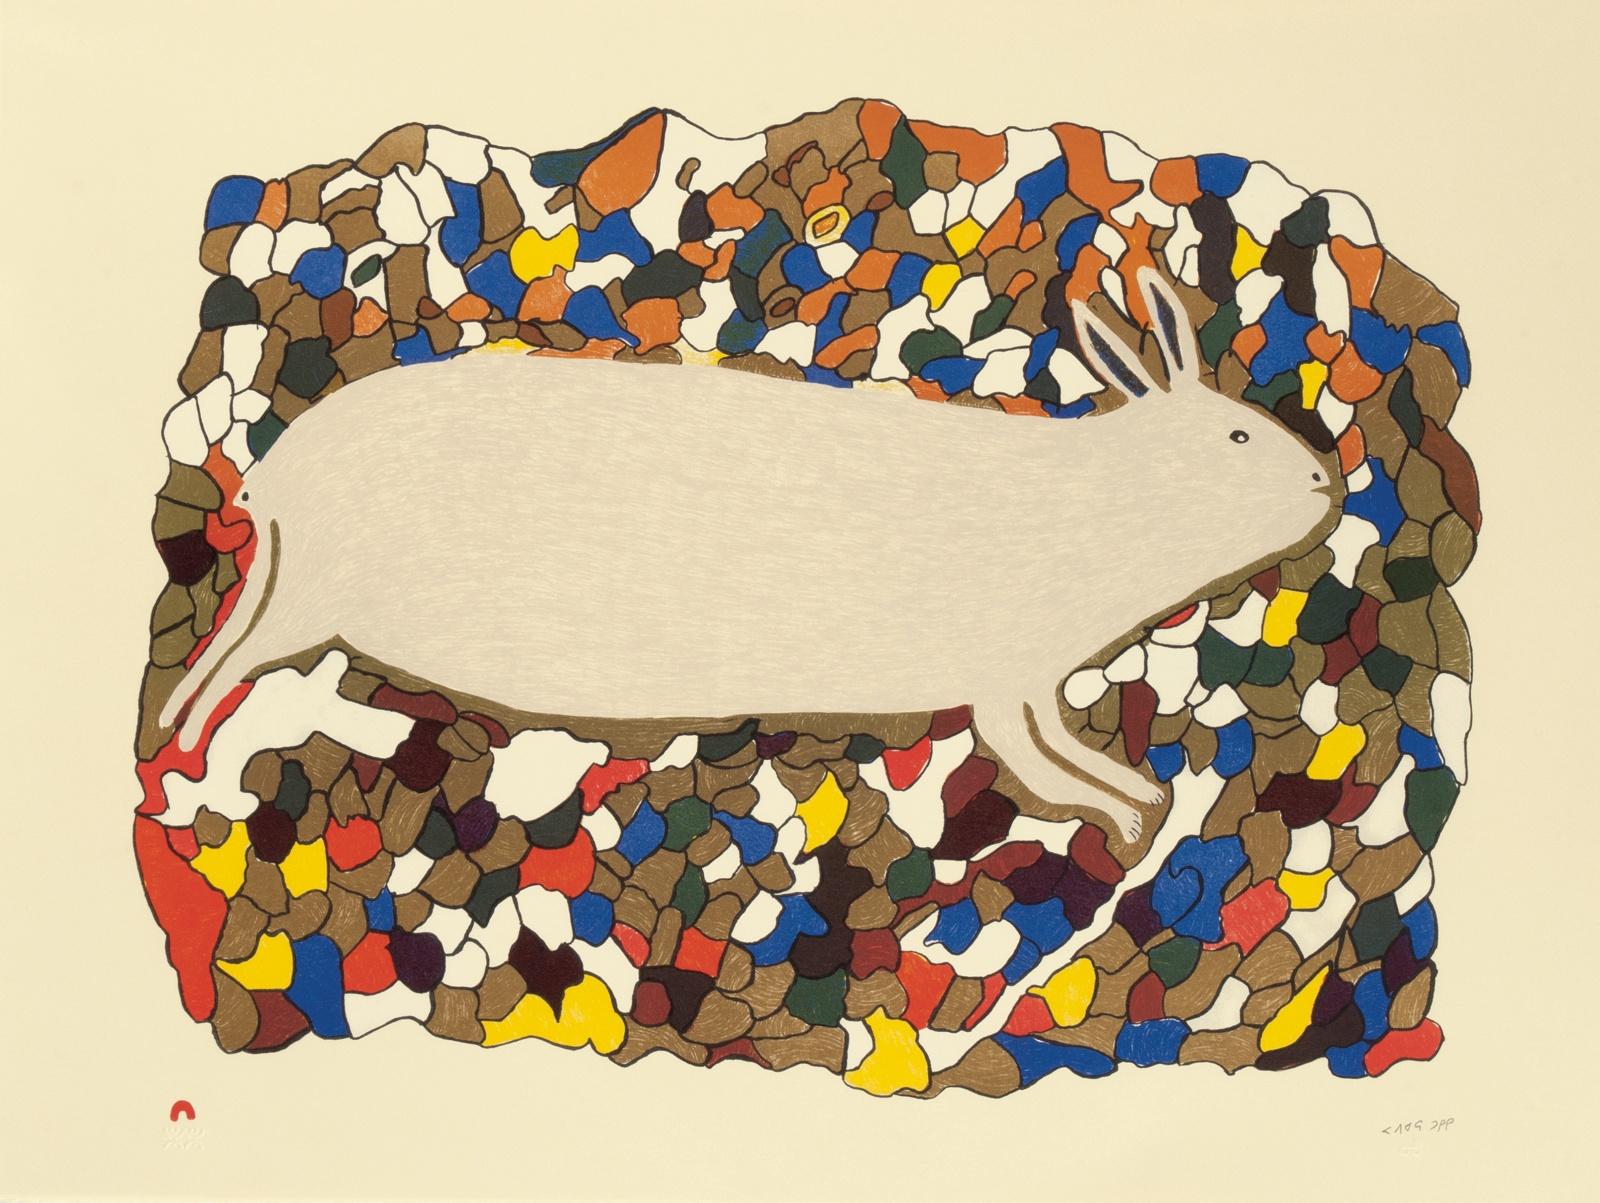 Papiara Tukiki Lithograph 22.25 x 29.75 600 startled hare inuit print cape dorset